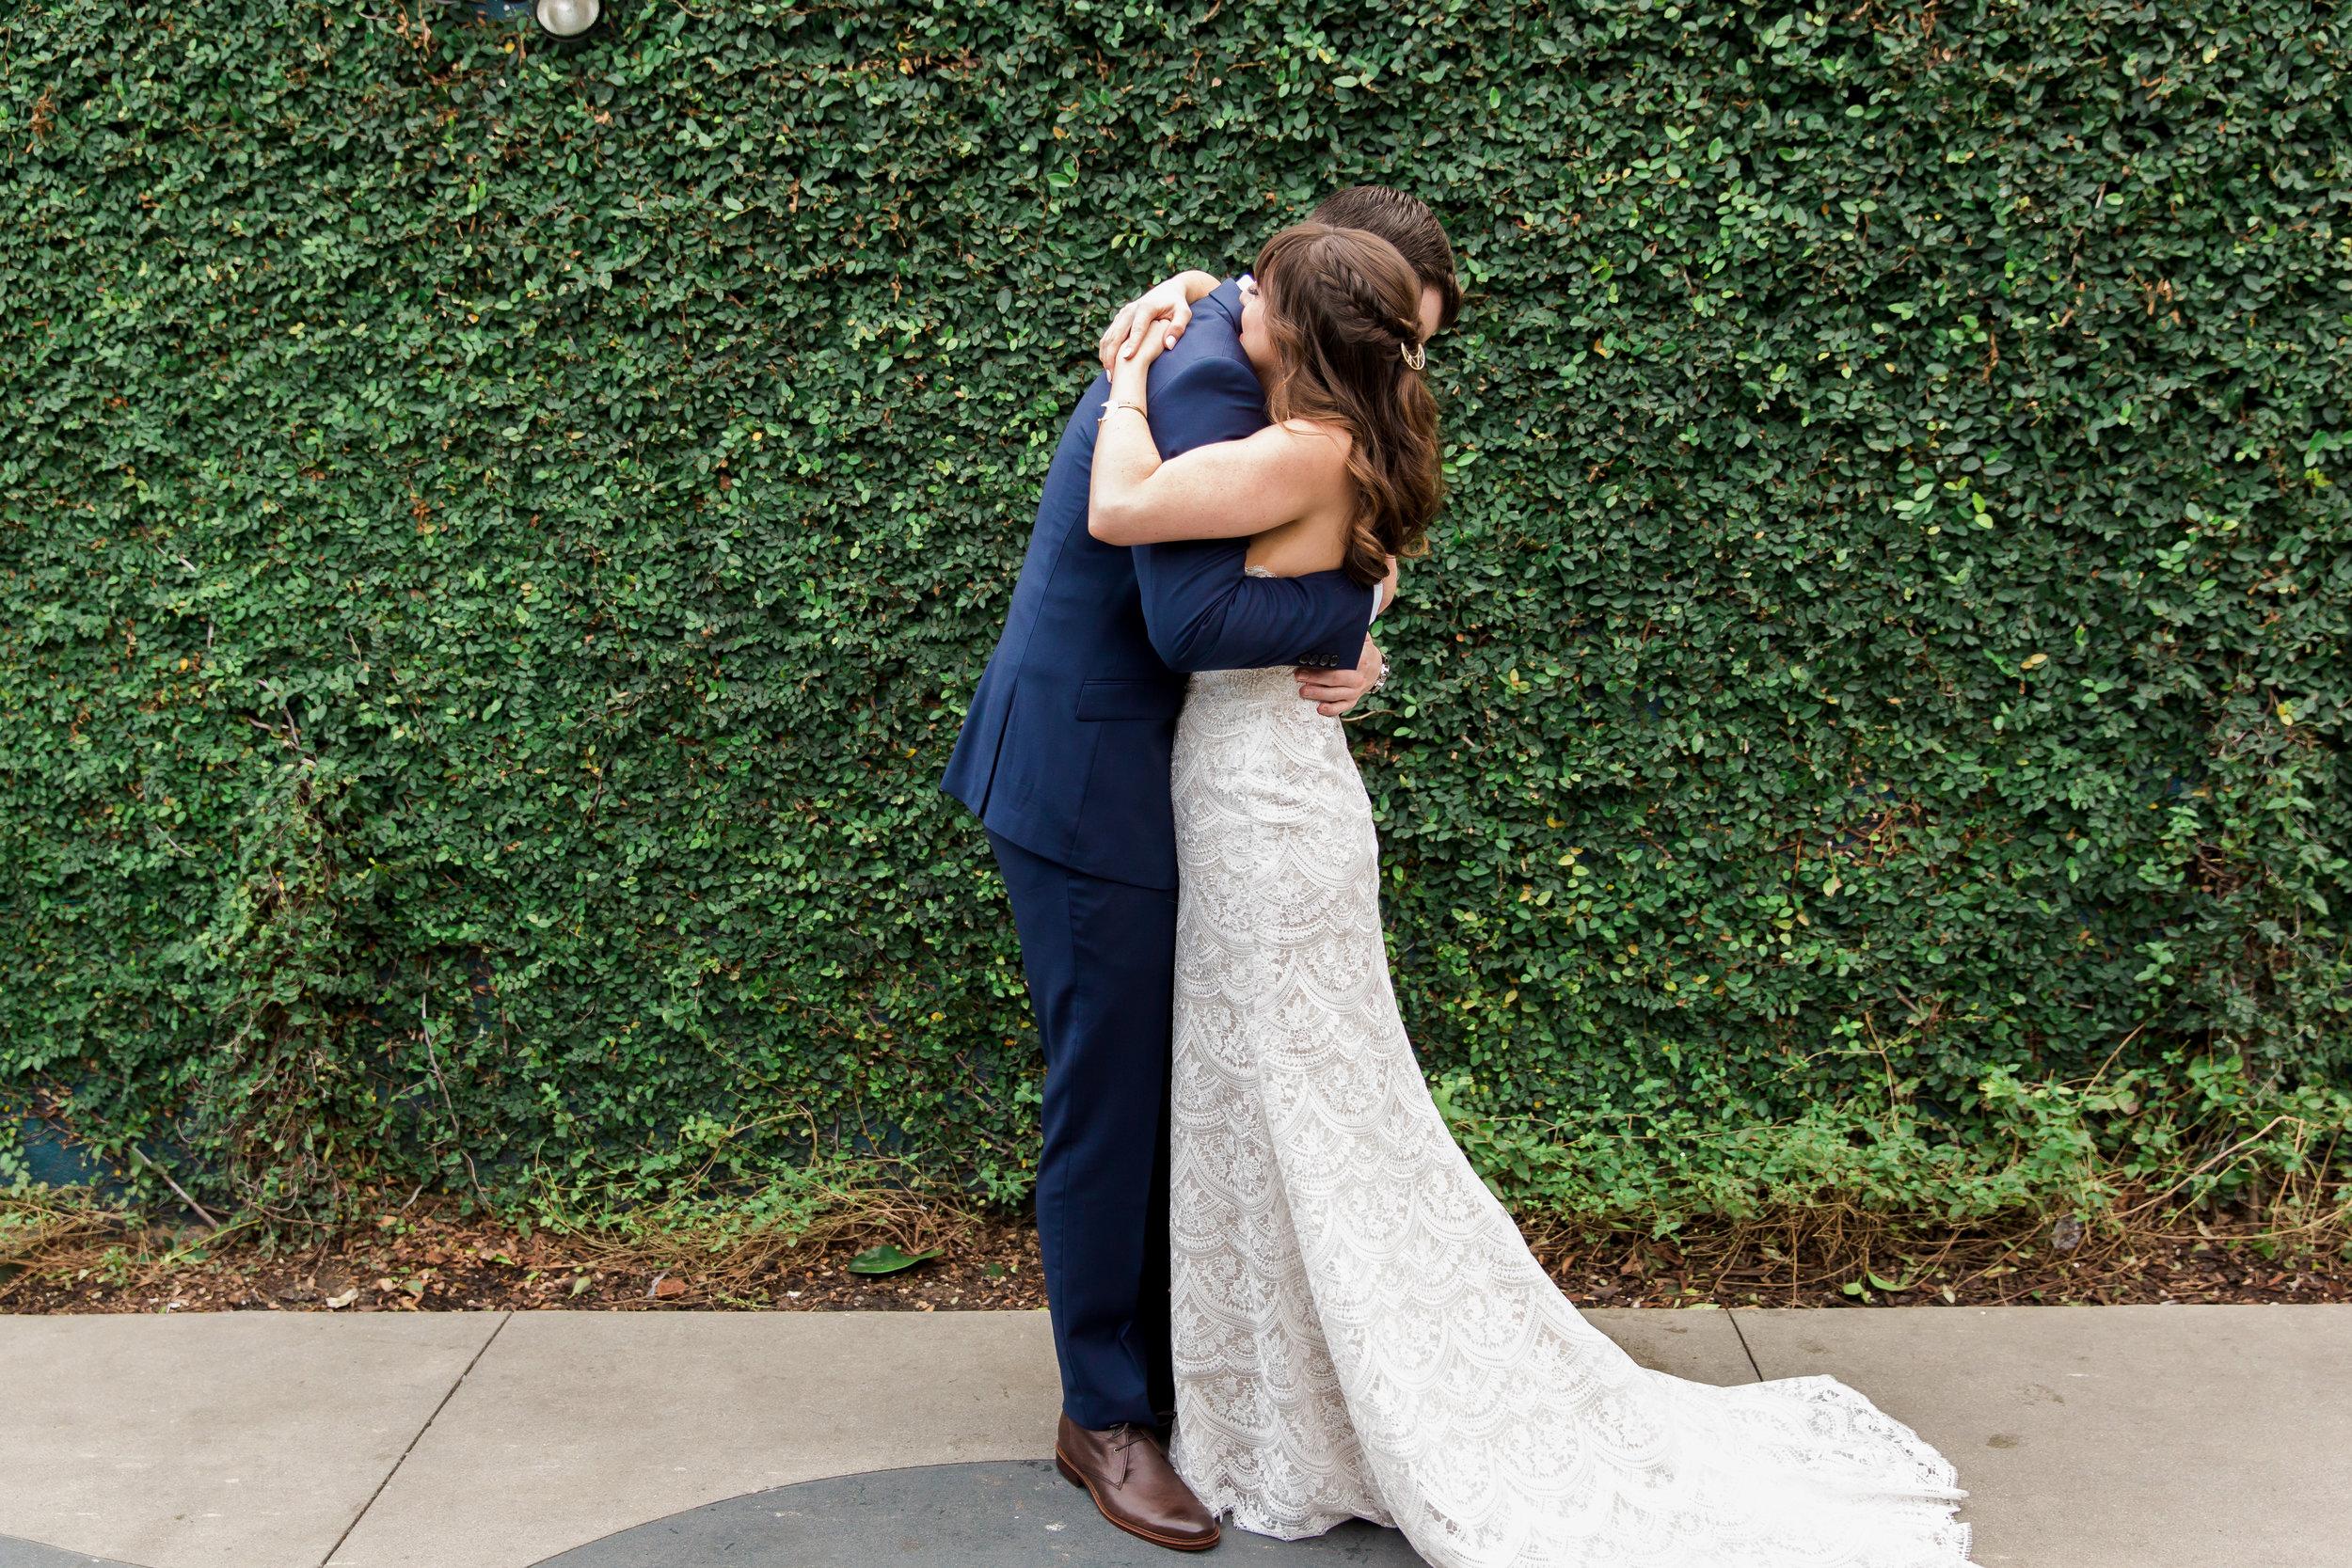 0207_Michael-and-Sarahs-wedding.jpg